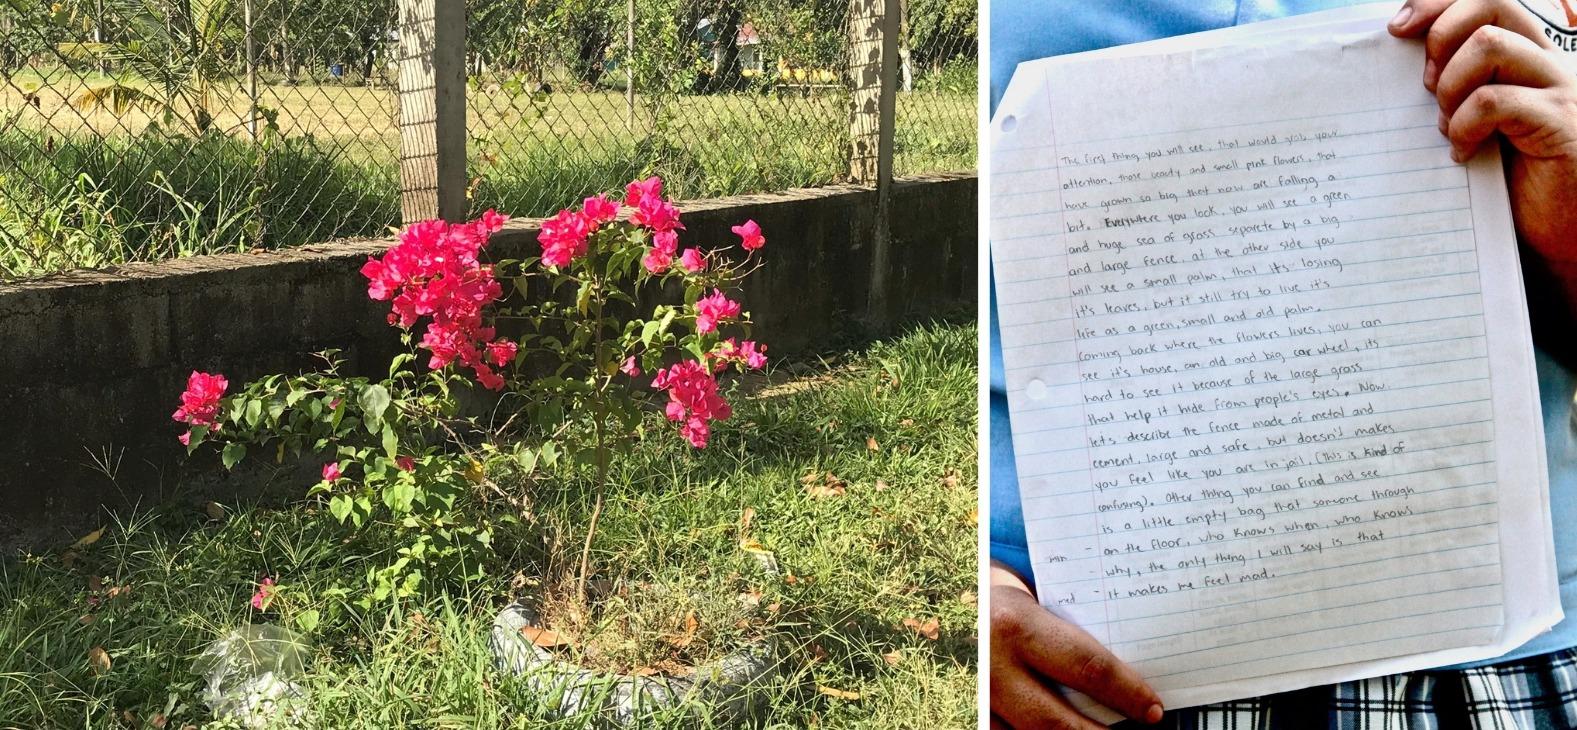 germayoni writing and photo piece